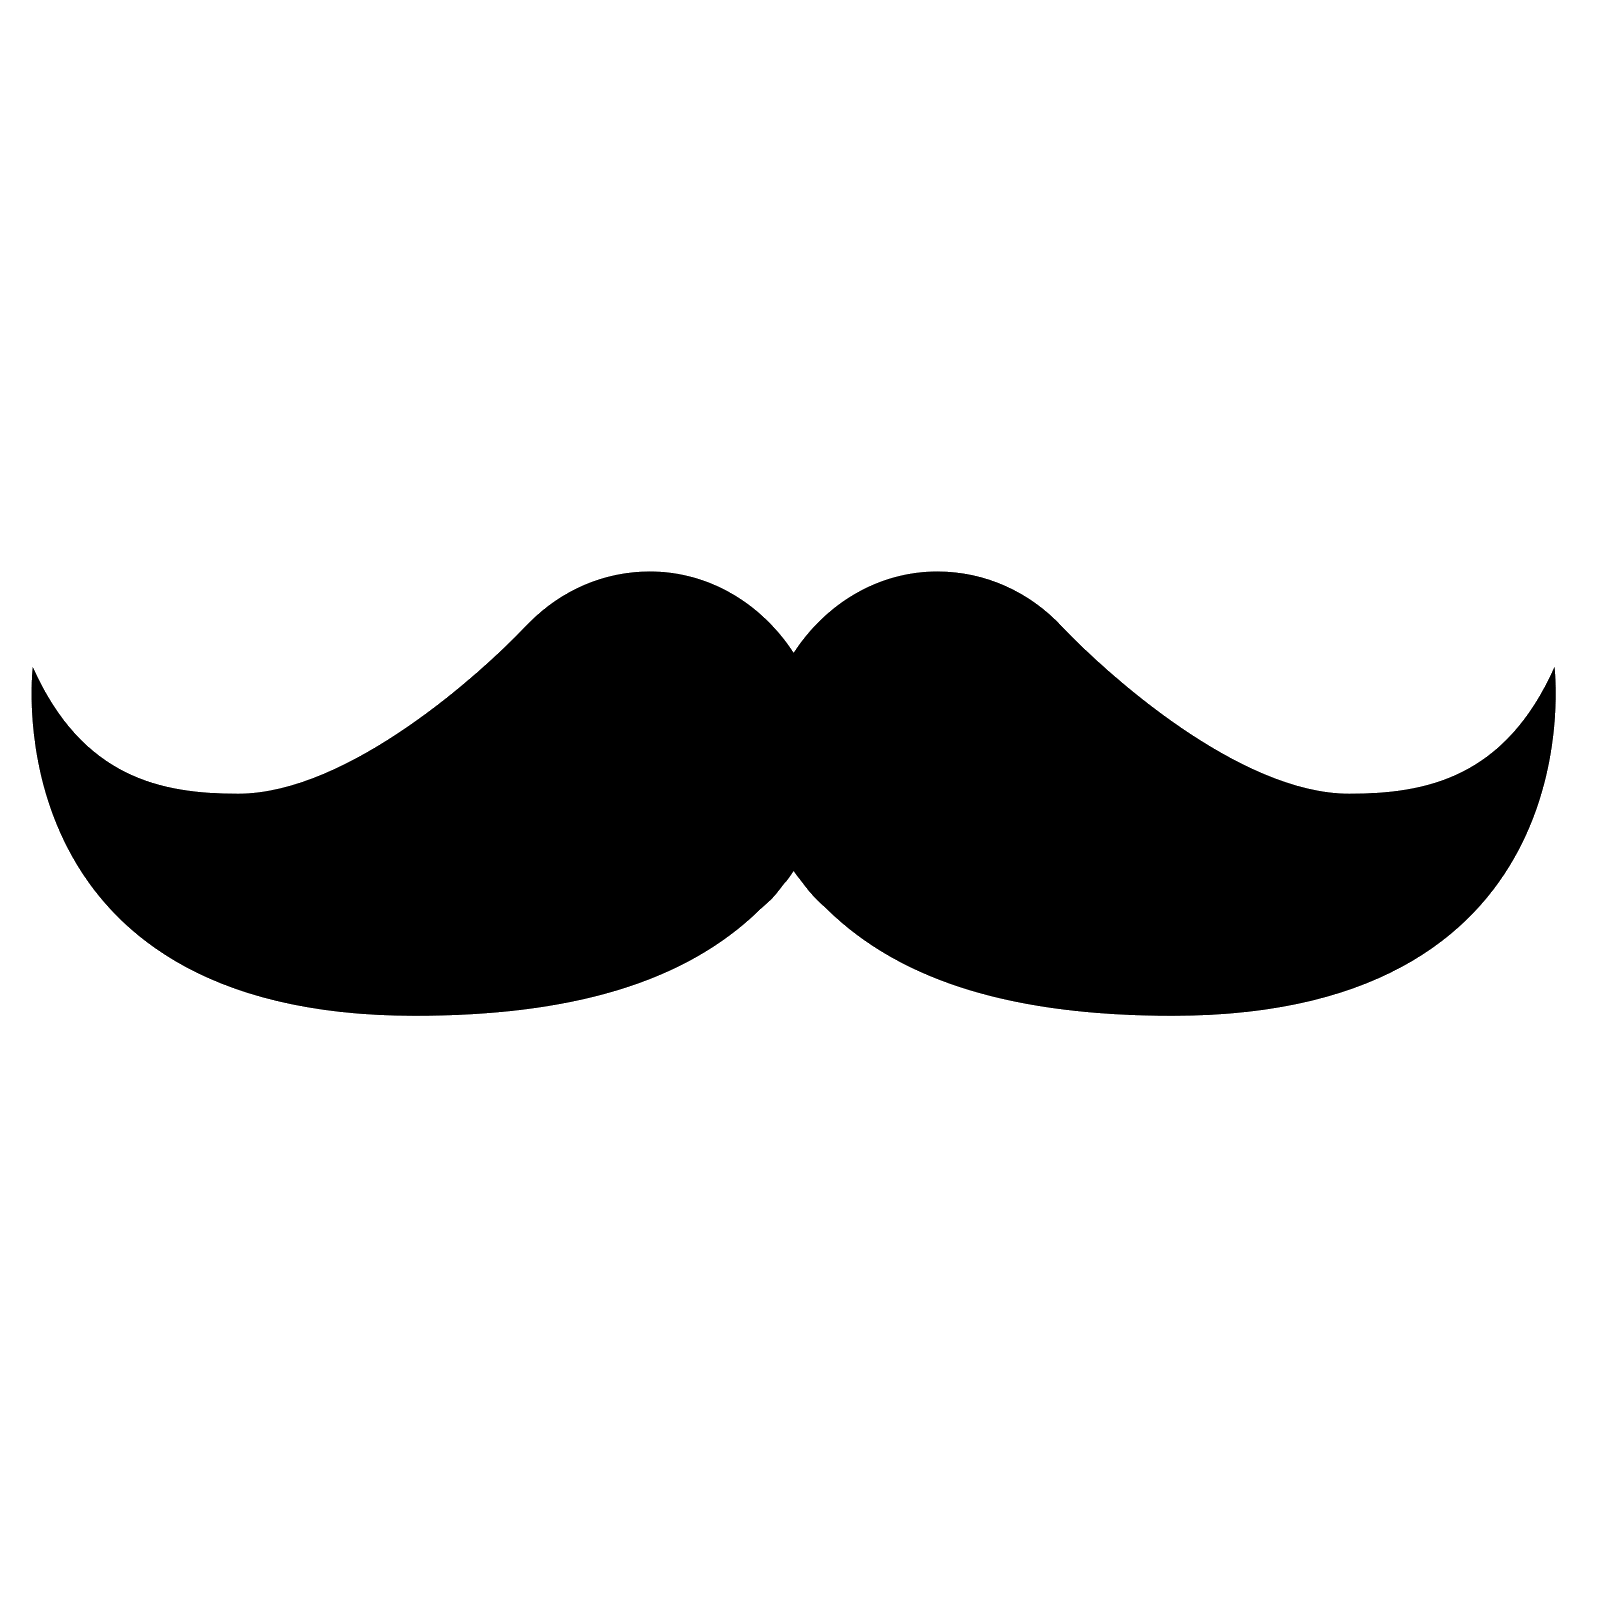 1600x1600 Bigote Icon